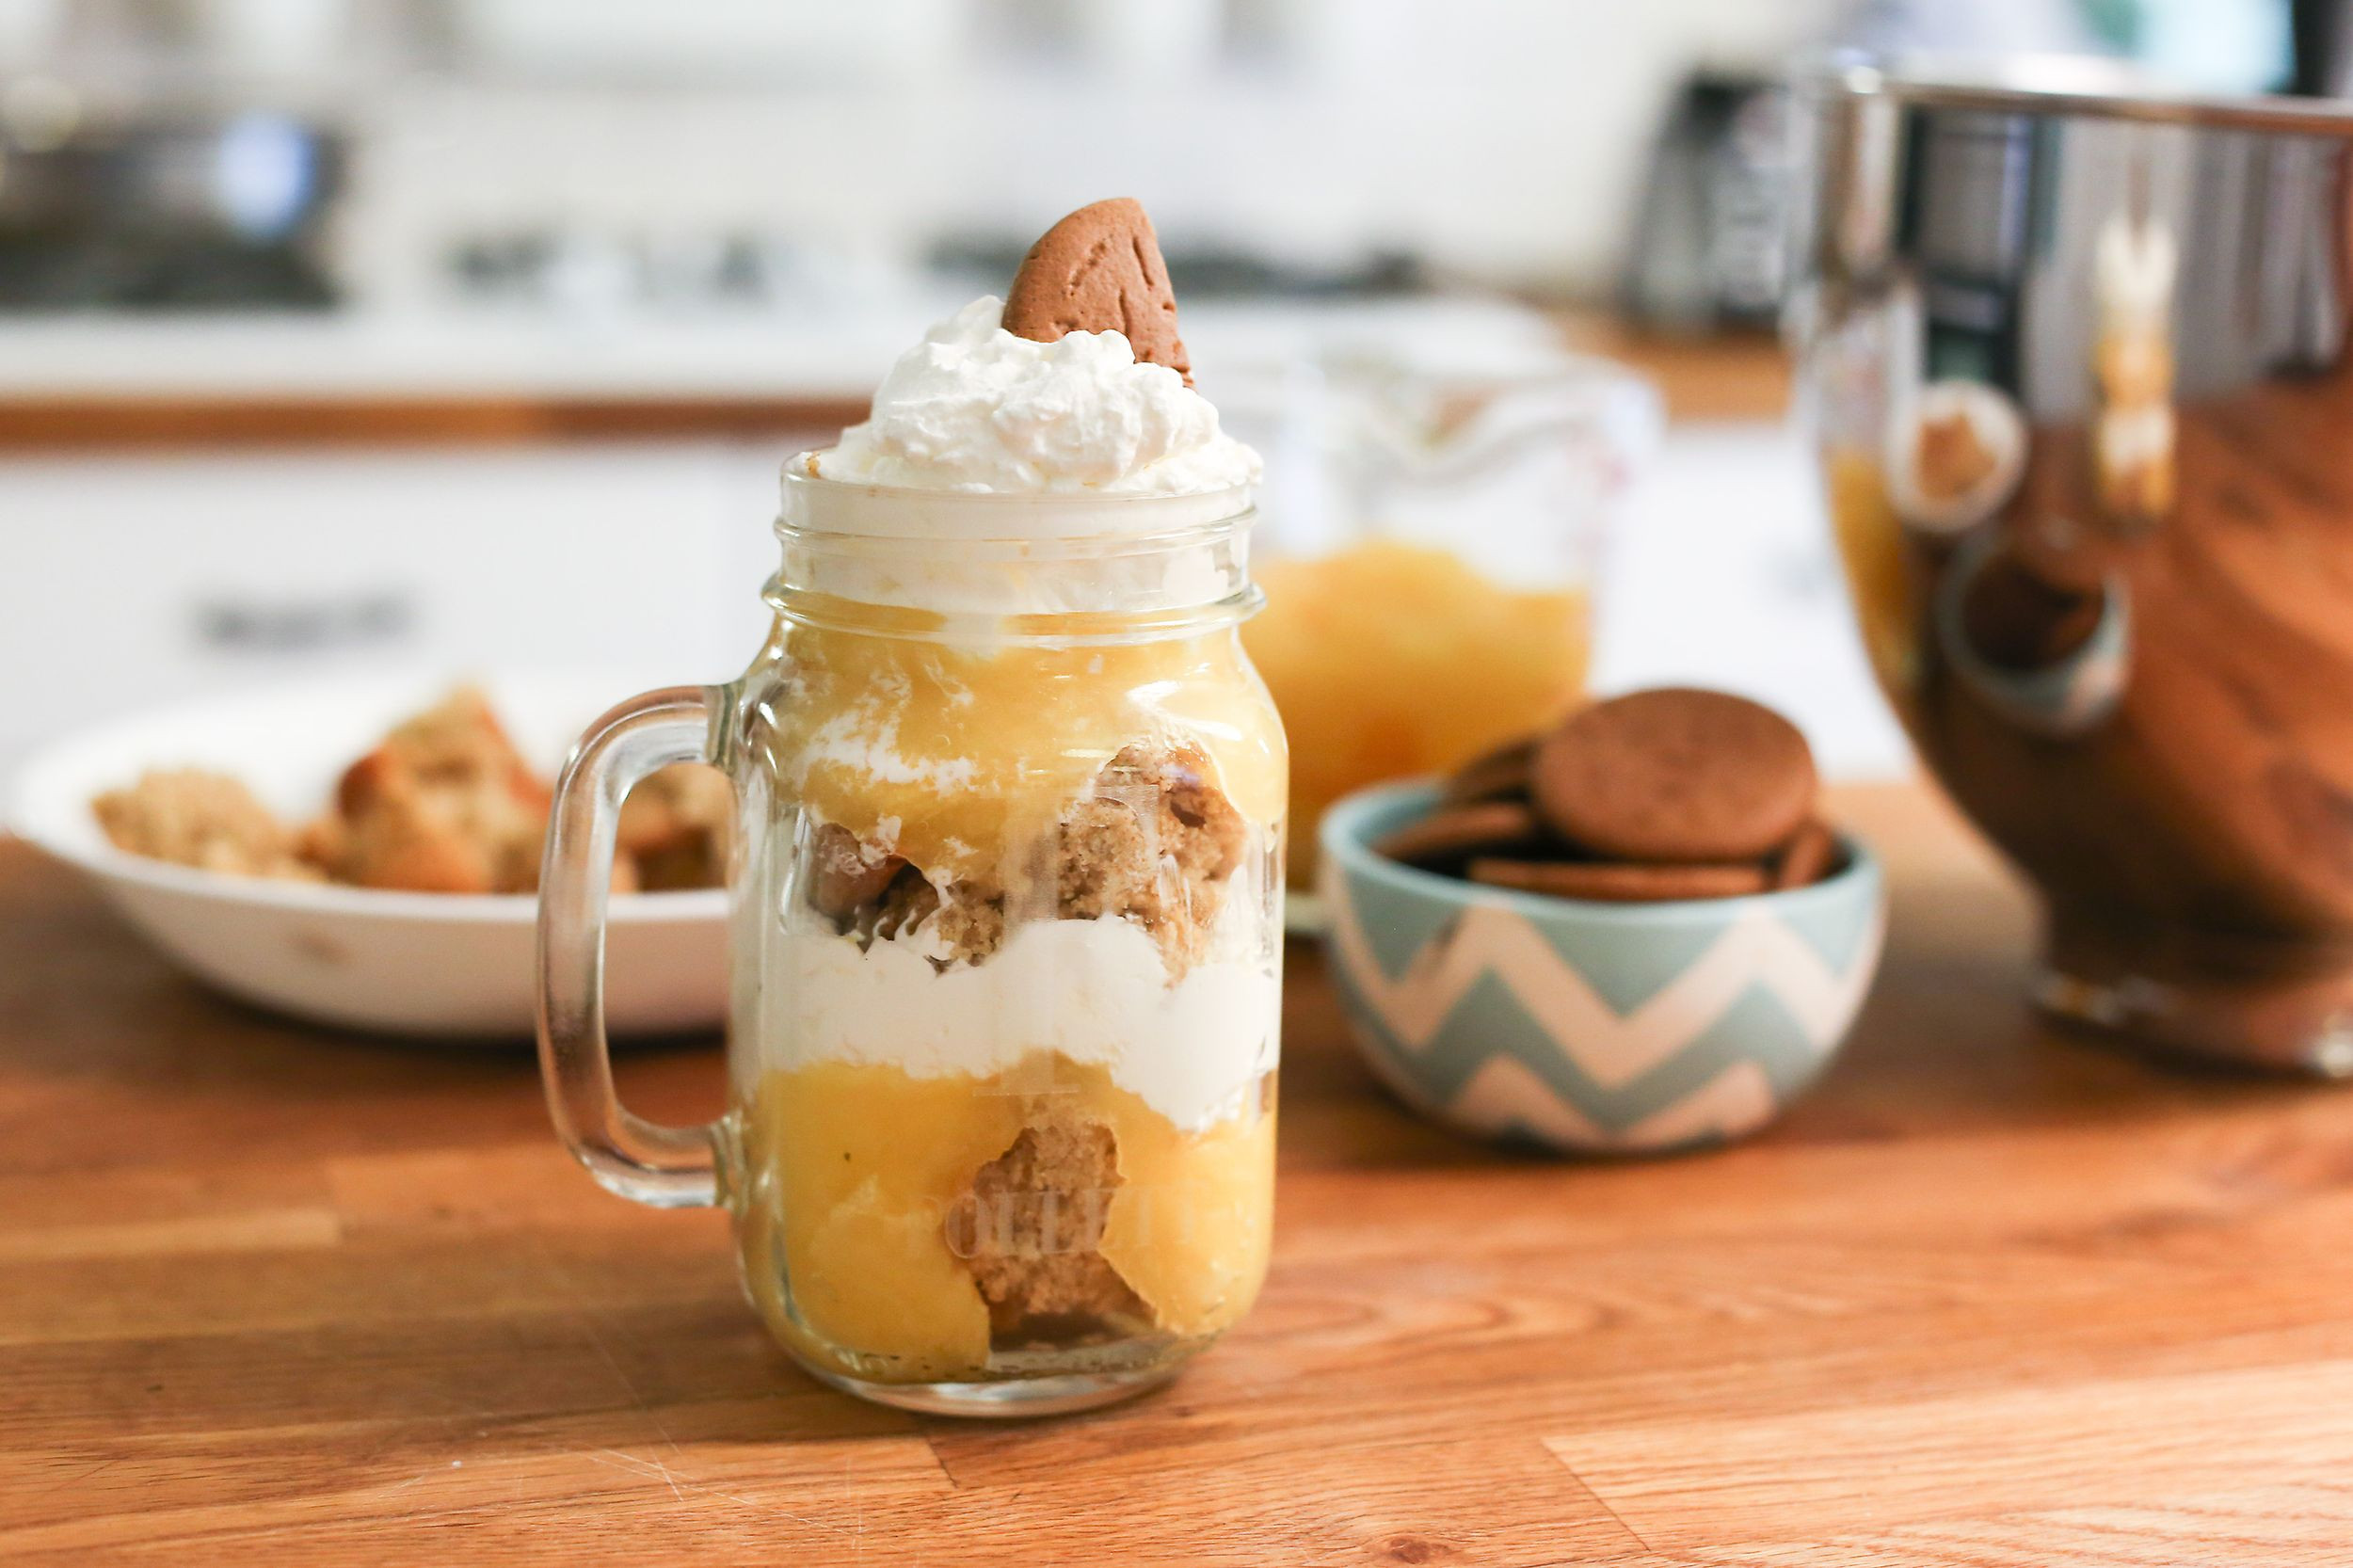 Mason Jar Dessert Recipes  11 easy and delicious mason jar dessert recipes Reviewed